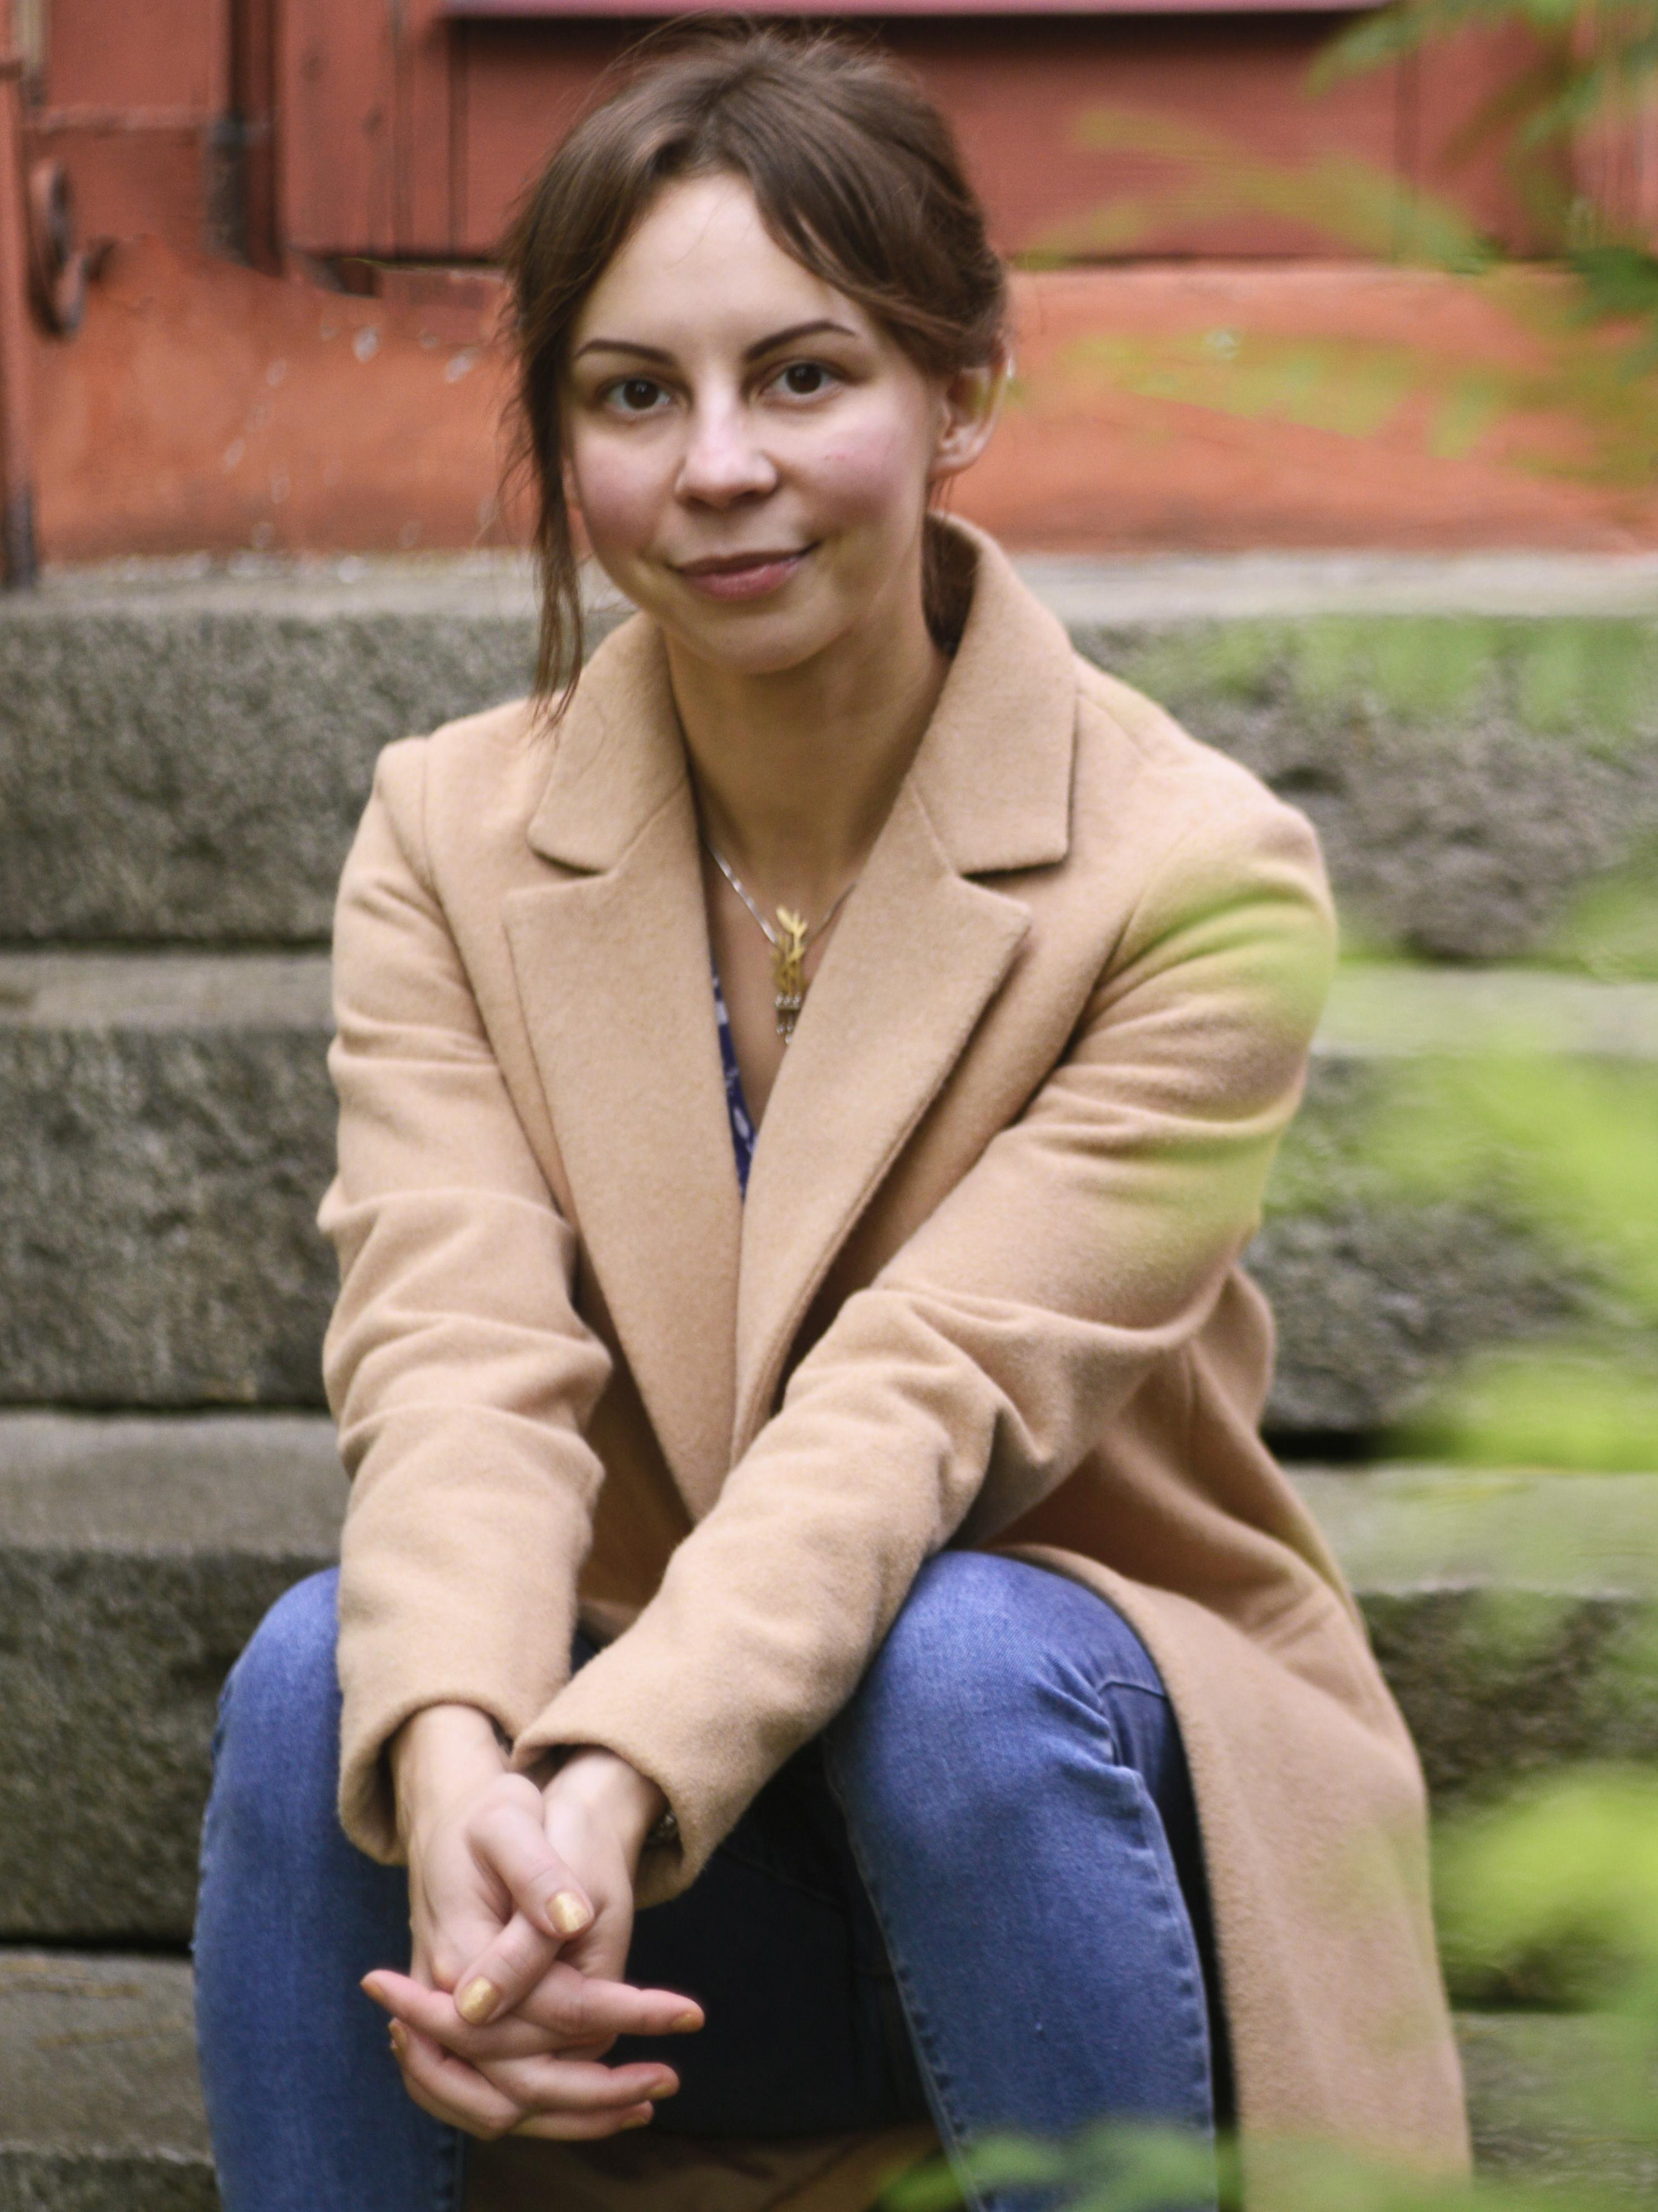 Karolina Krzemianowska founder of Inner Light Yoga